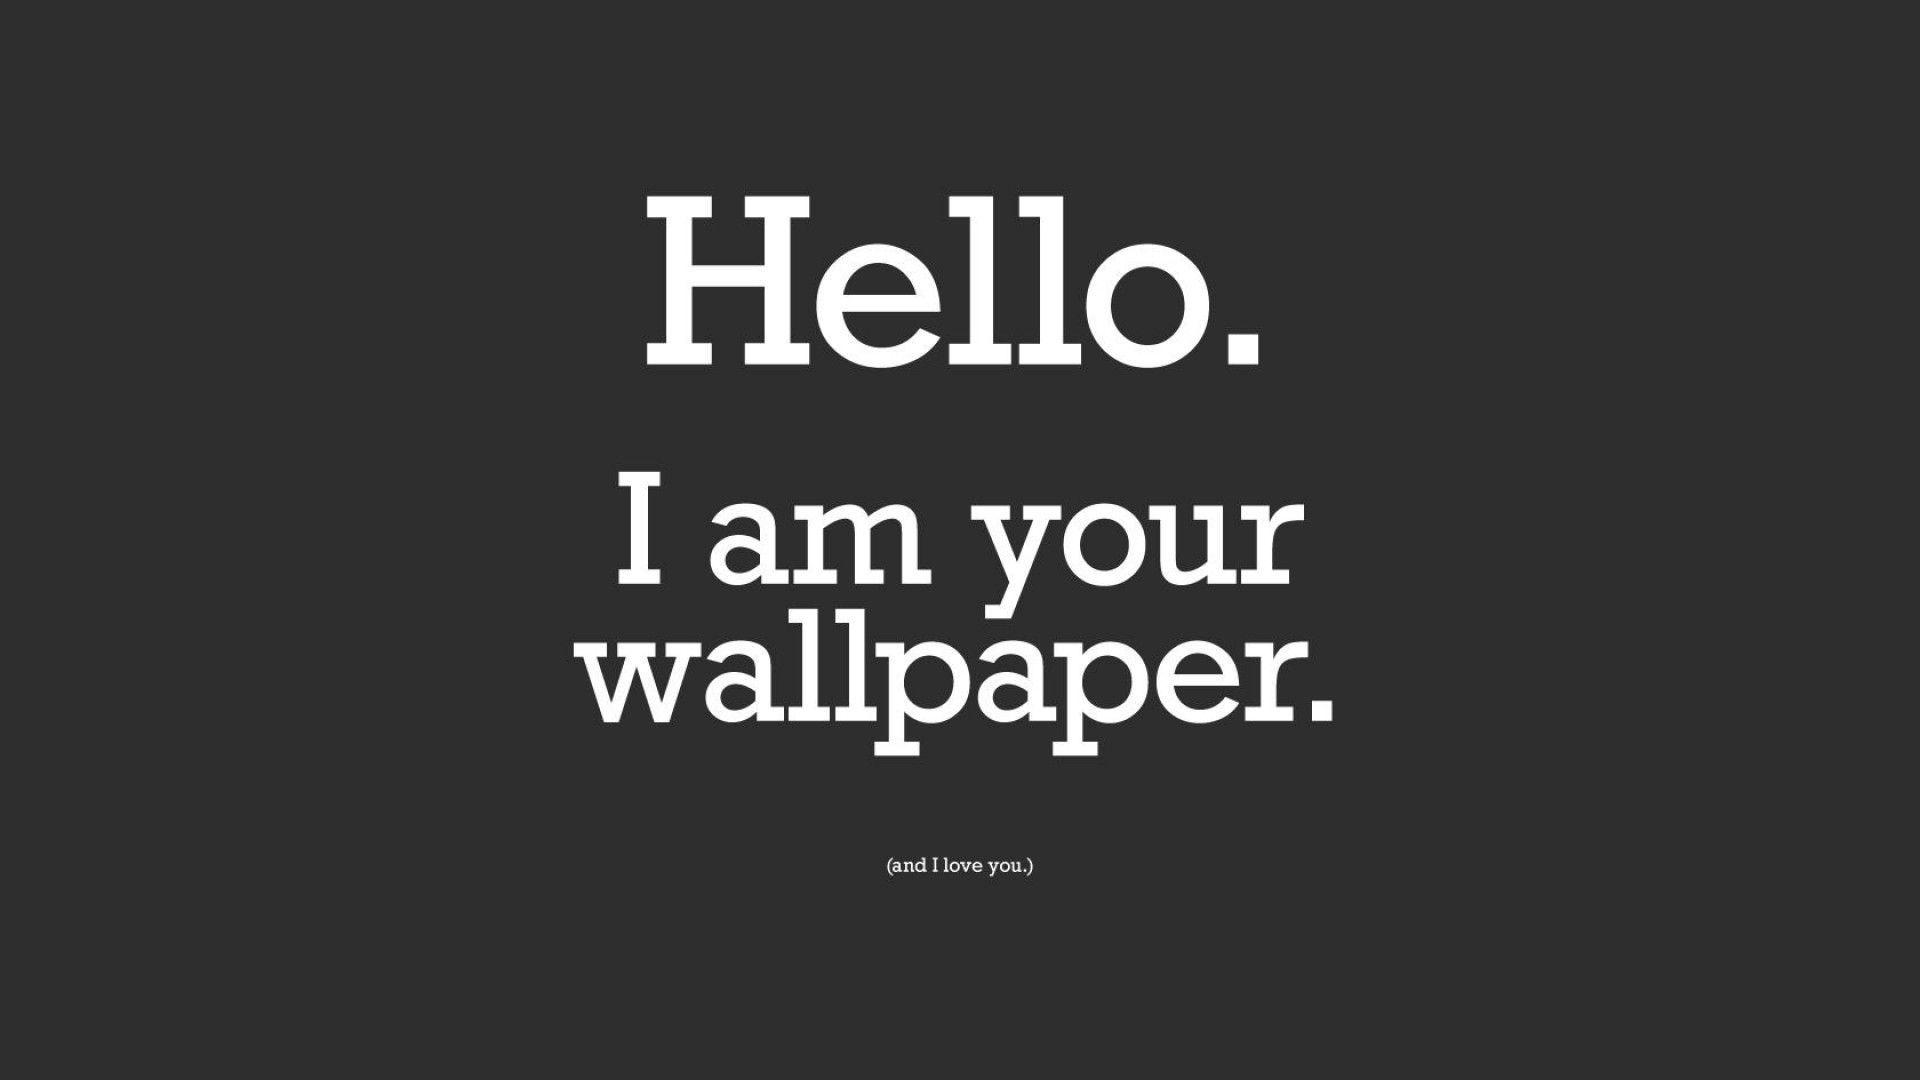 Funny Wallpaper Free Funny Hd Wallpaper Hd 6160